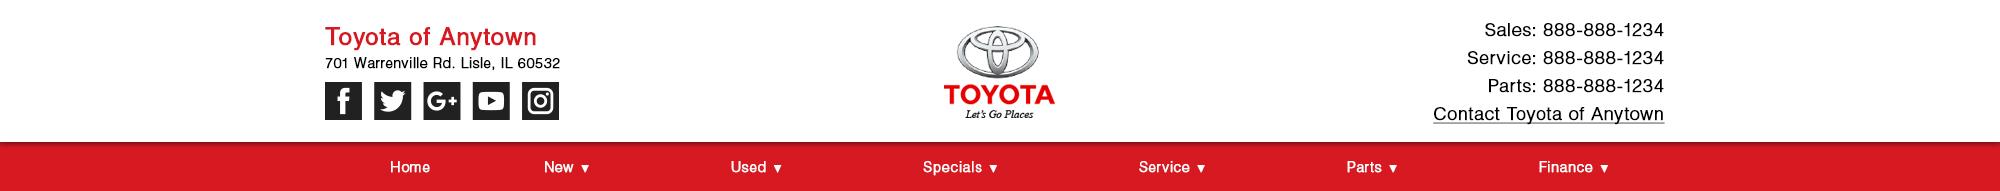 Toyota website header, option 4